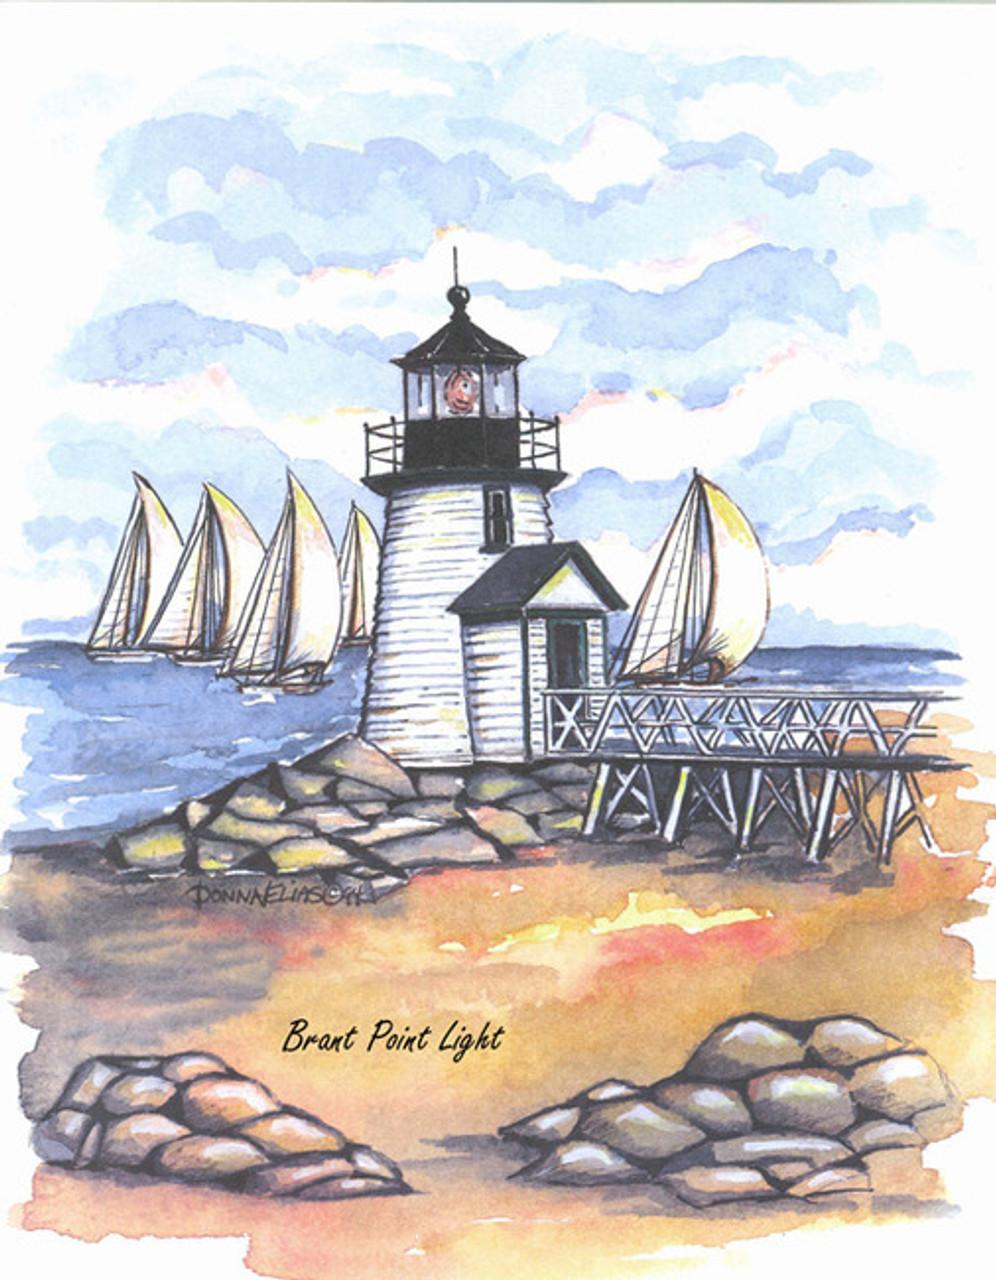 Brant Point Lighthouse copyright Donna Elias